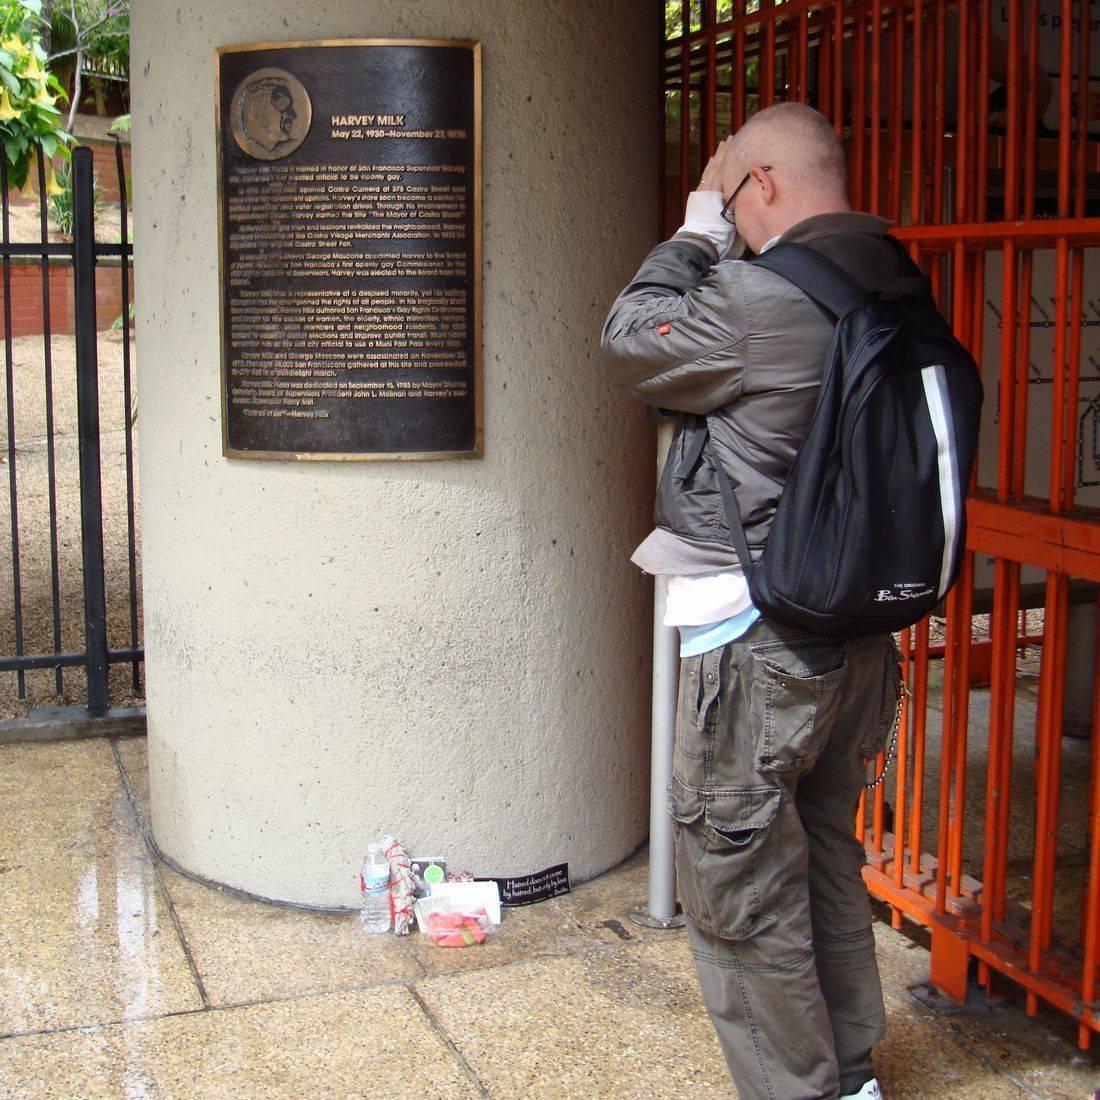 Earthmoves art pilgimage sacred secular LGBT Harvey Milk San Francisco